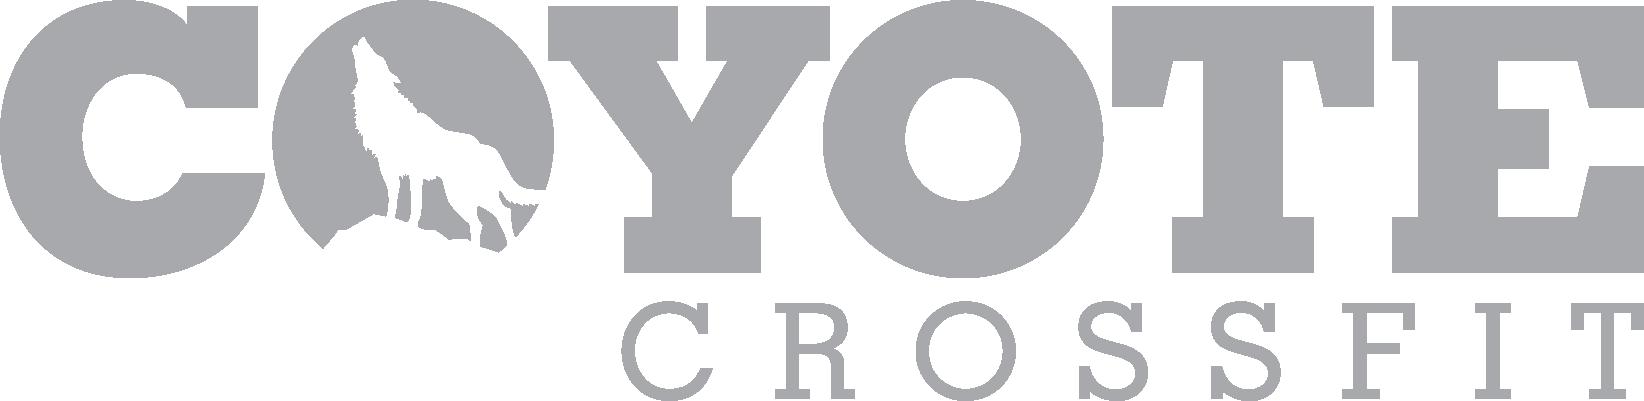 Coyote Crossfit Logo.png